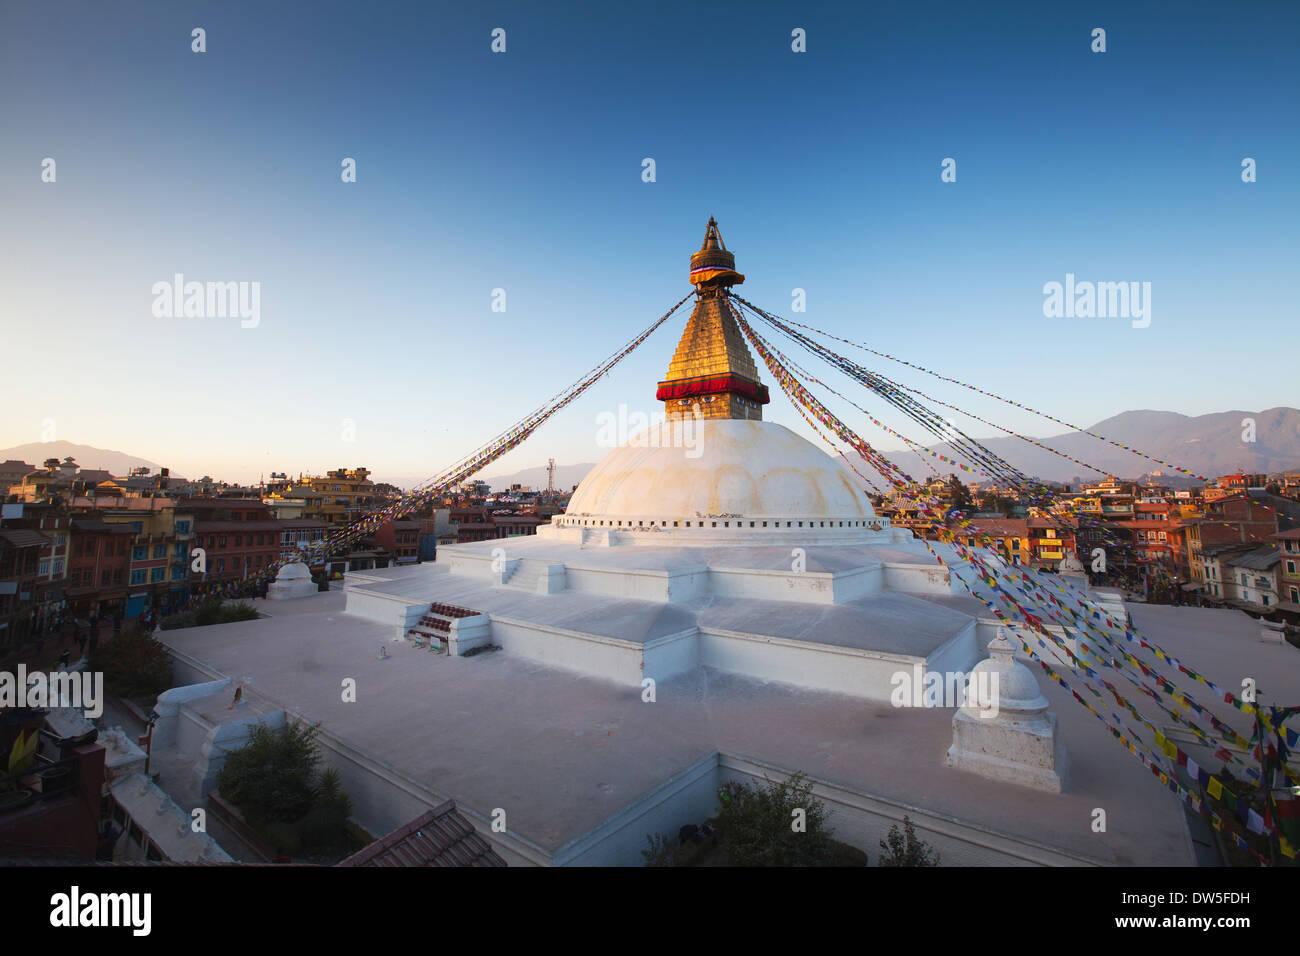 Boudhanath stupa in Kathmandu, Nepal - Stock Image